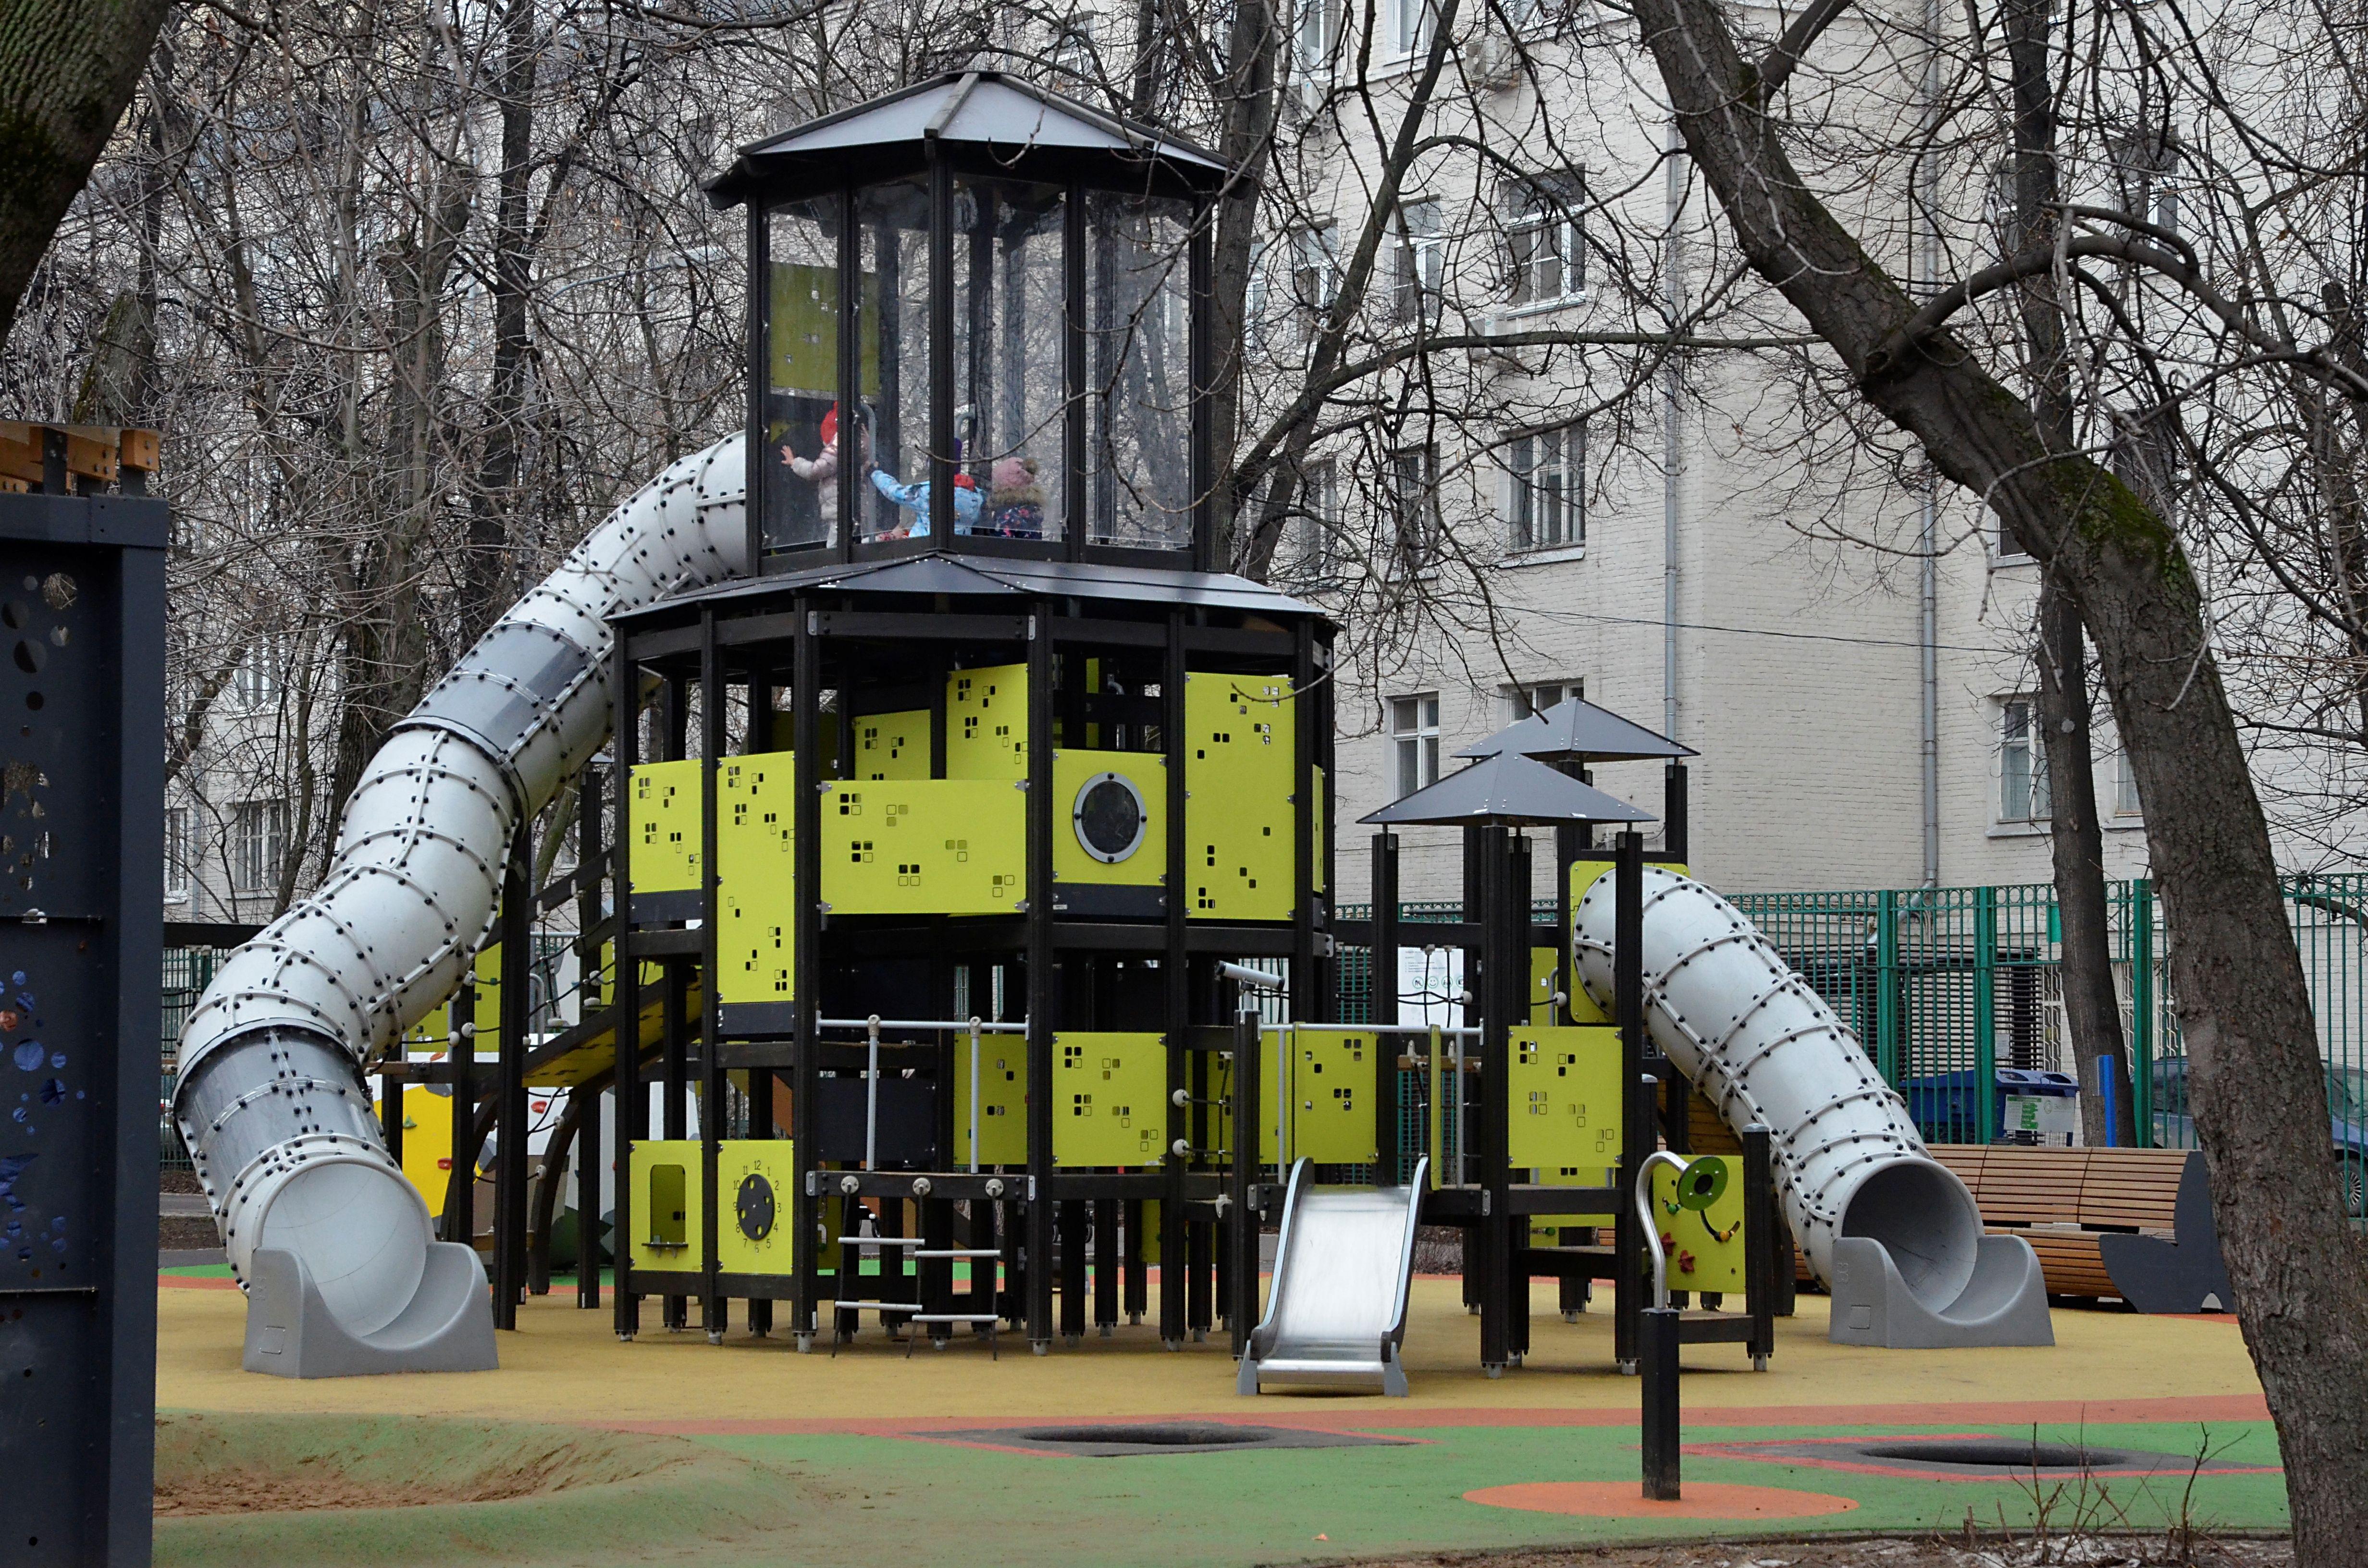 Детская площадка установлена по нормативам. Фото: Анна Быкова